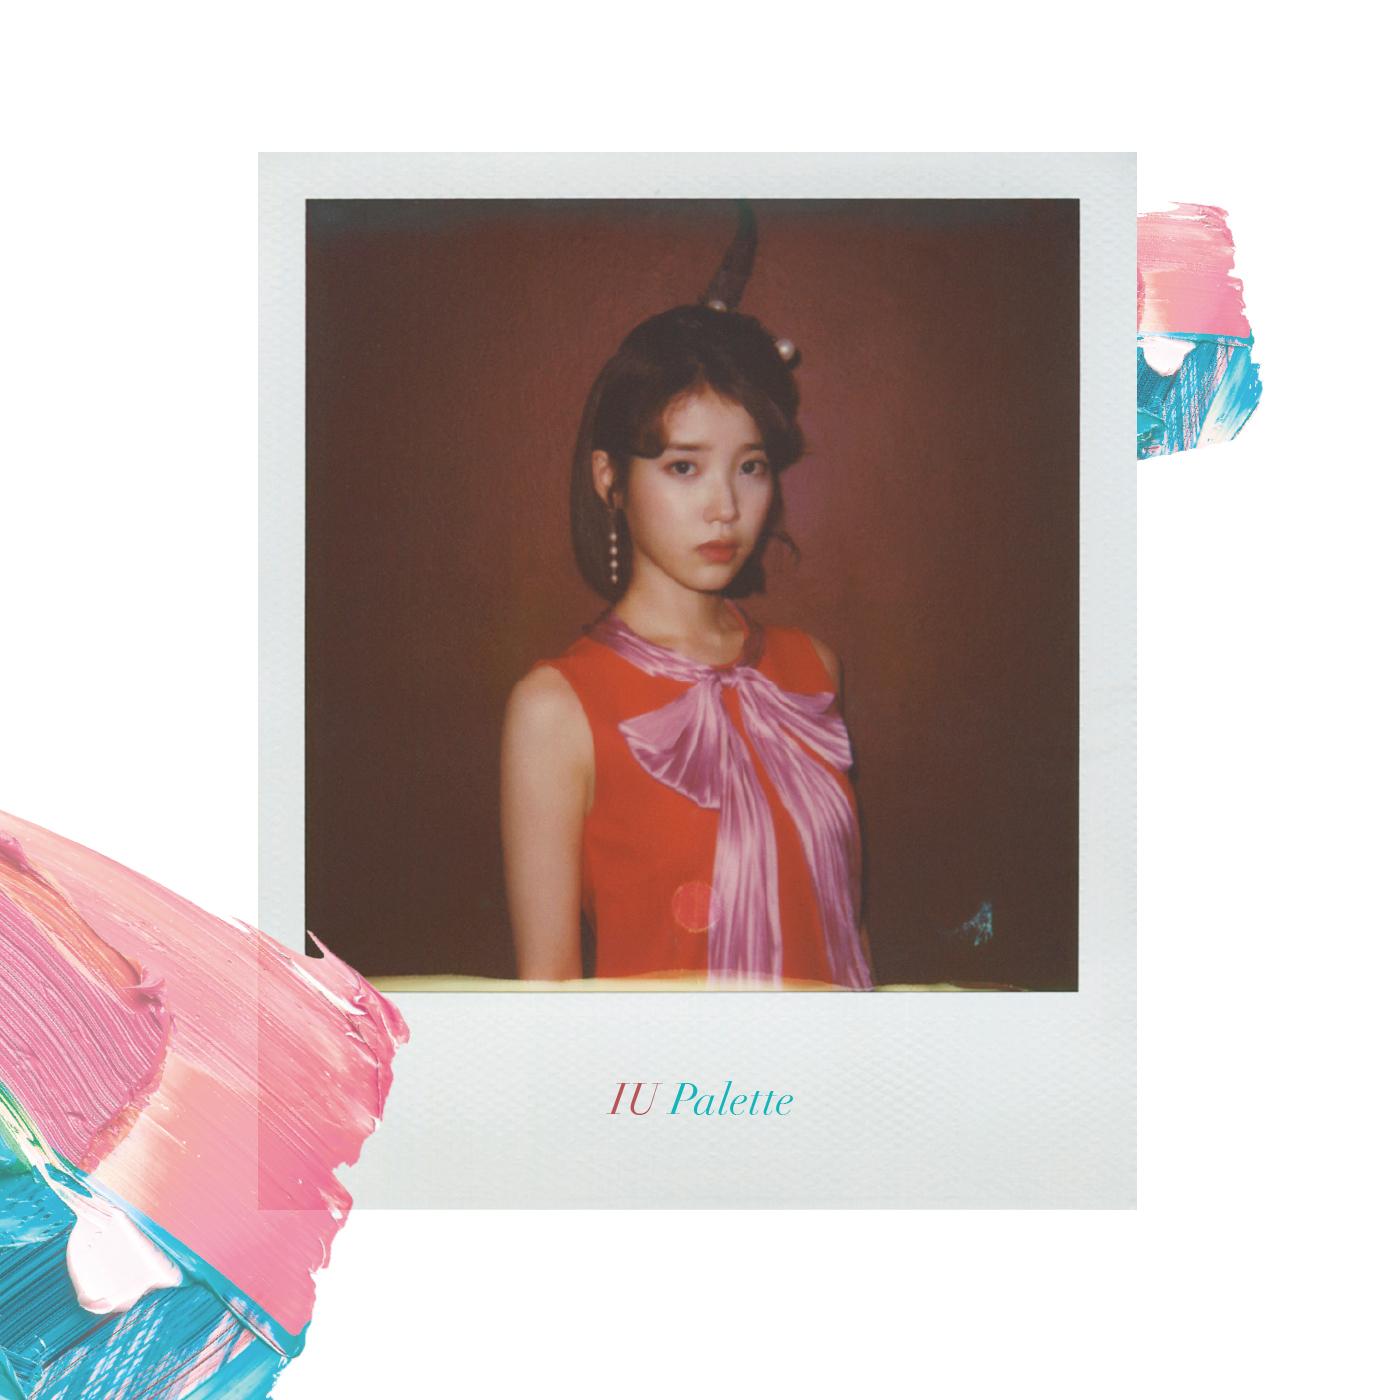 IU - Love Alone [Easy-Lyrics | ENG] - Lirik Lagu Korea